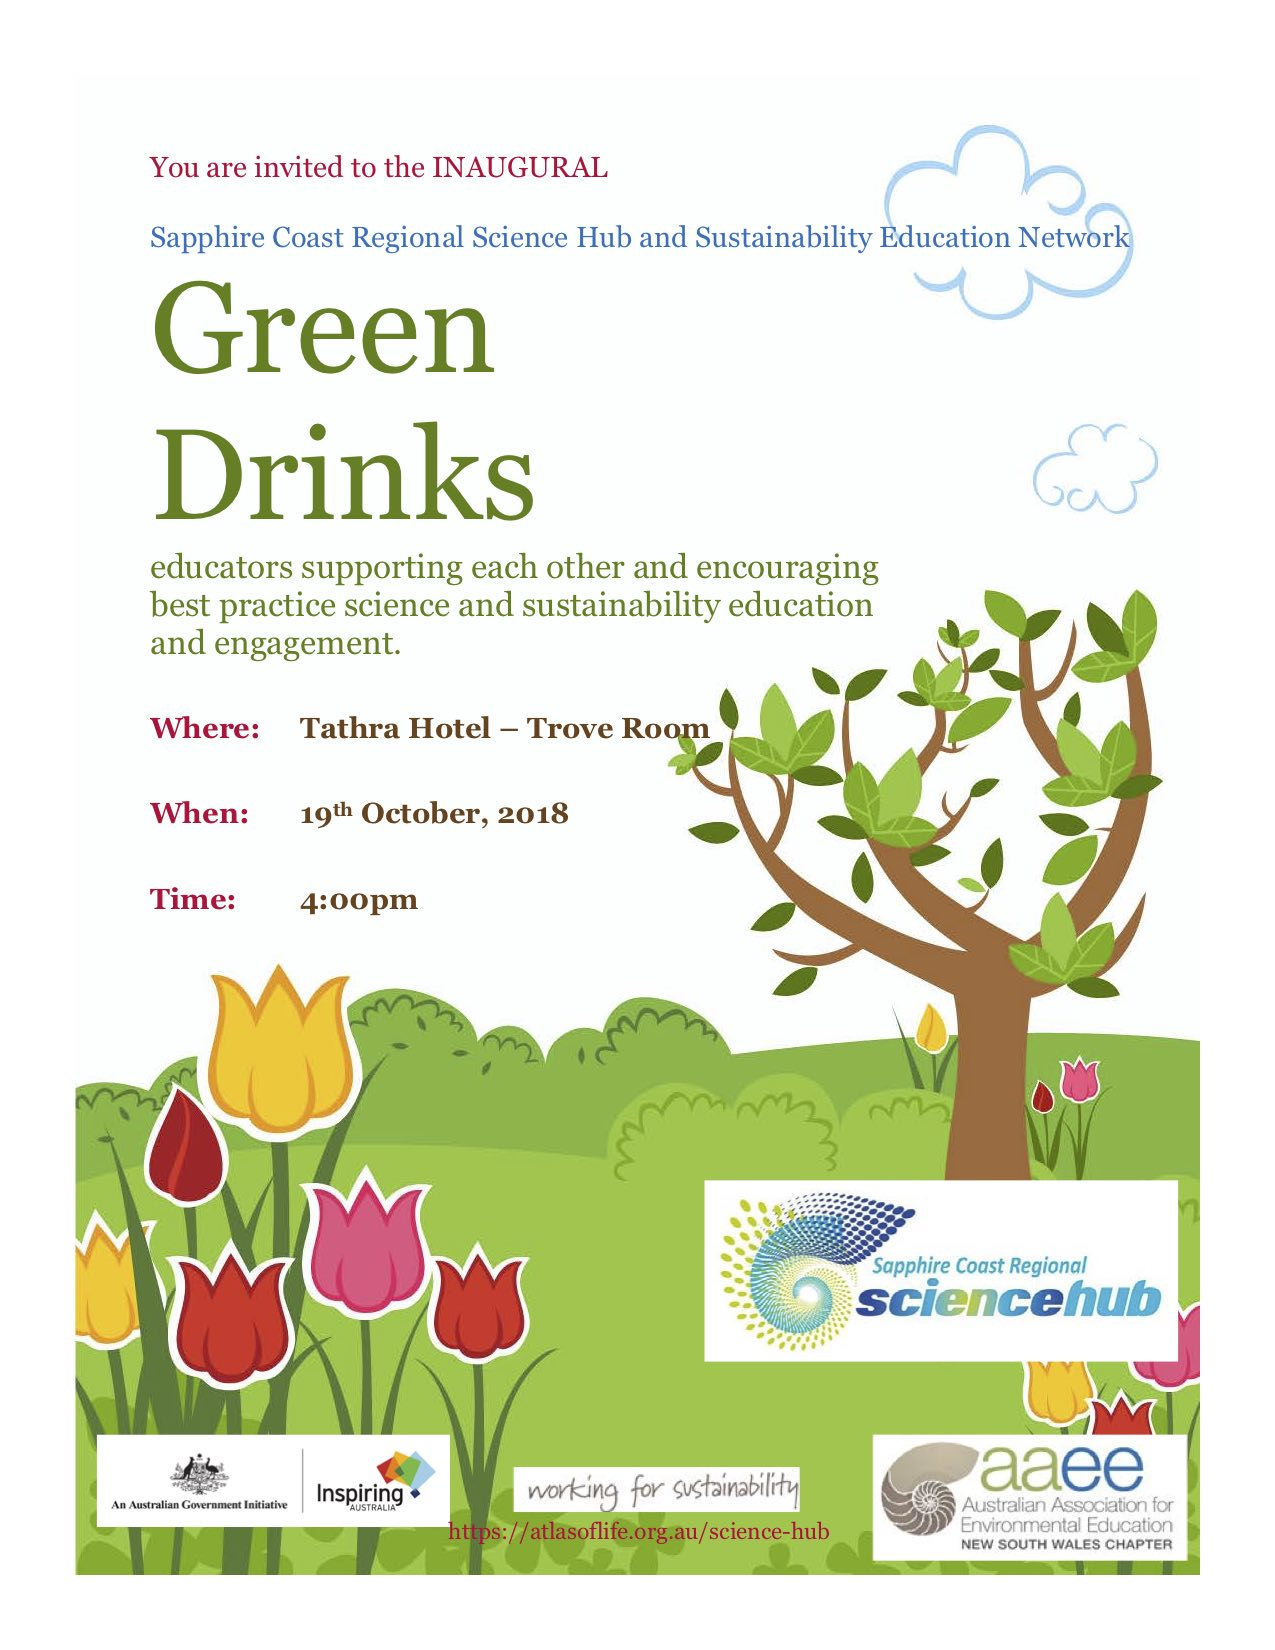 INAUGURAL Green Drinks.jpg